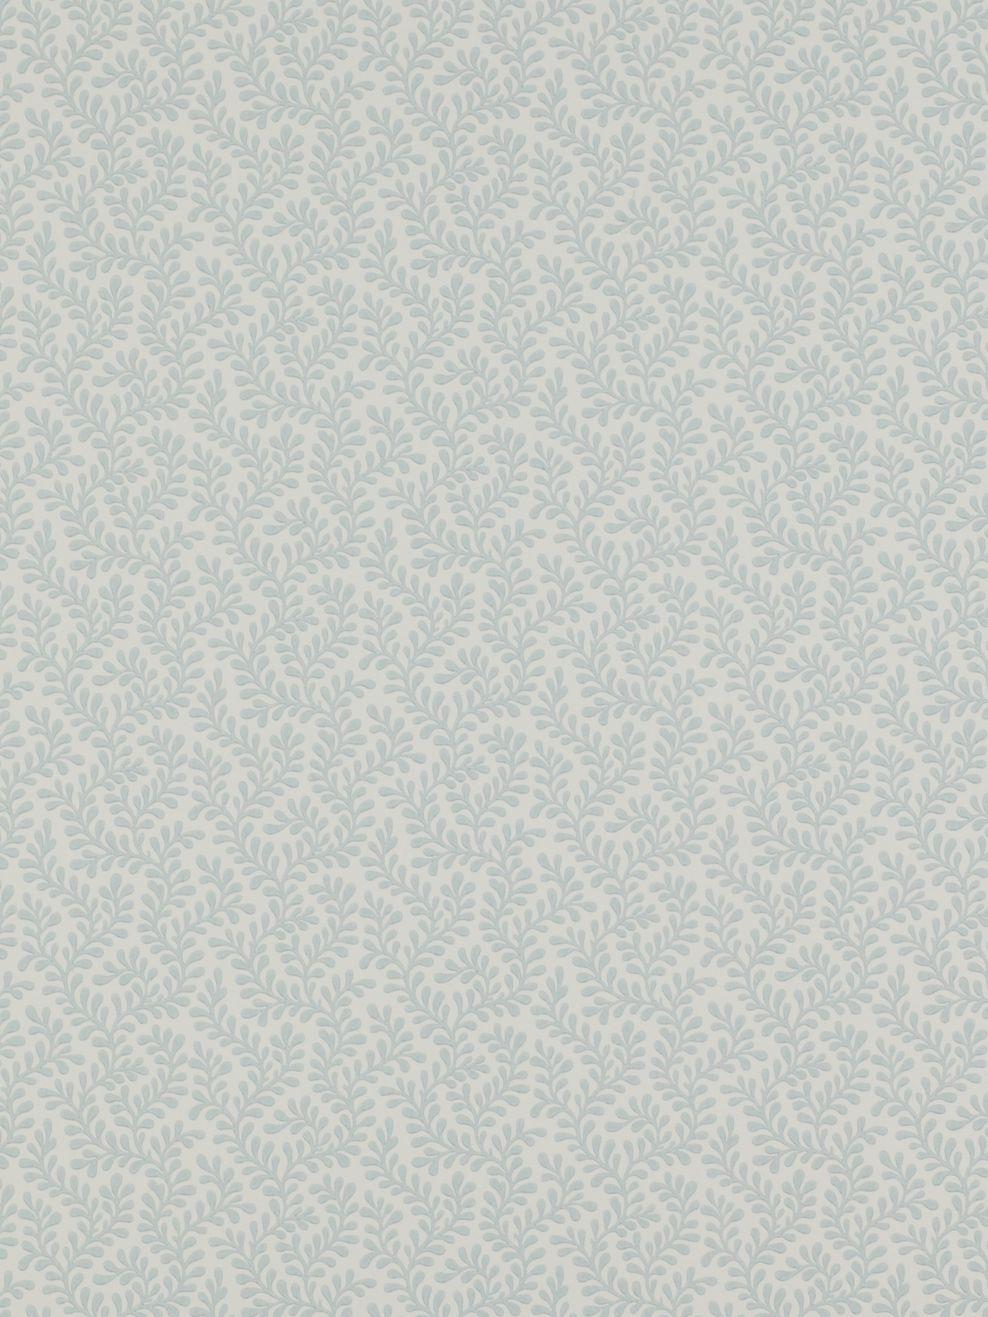 Colefax & Fowler Colefax & Fowler Rushmere Wallpaper